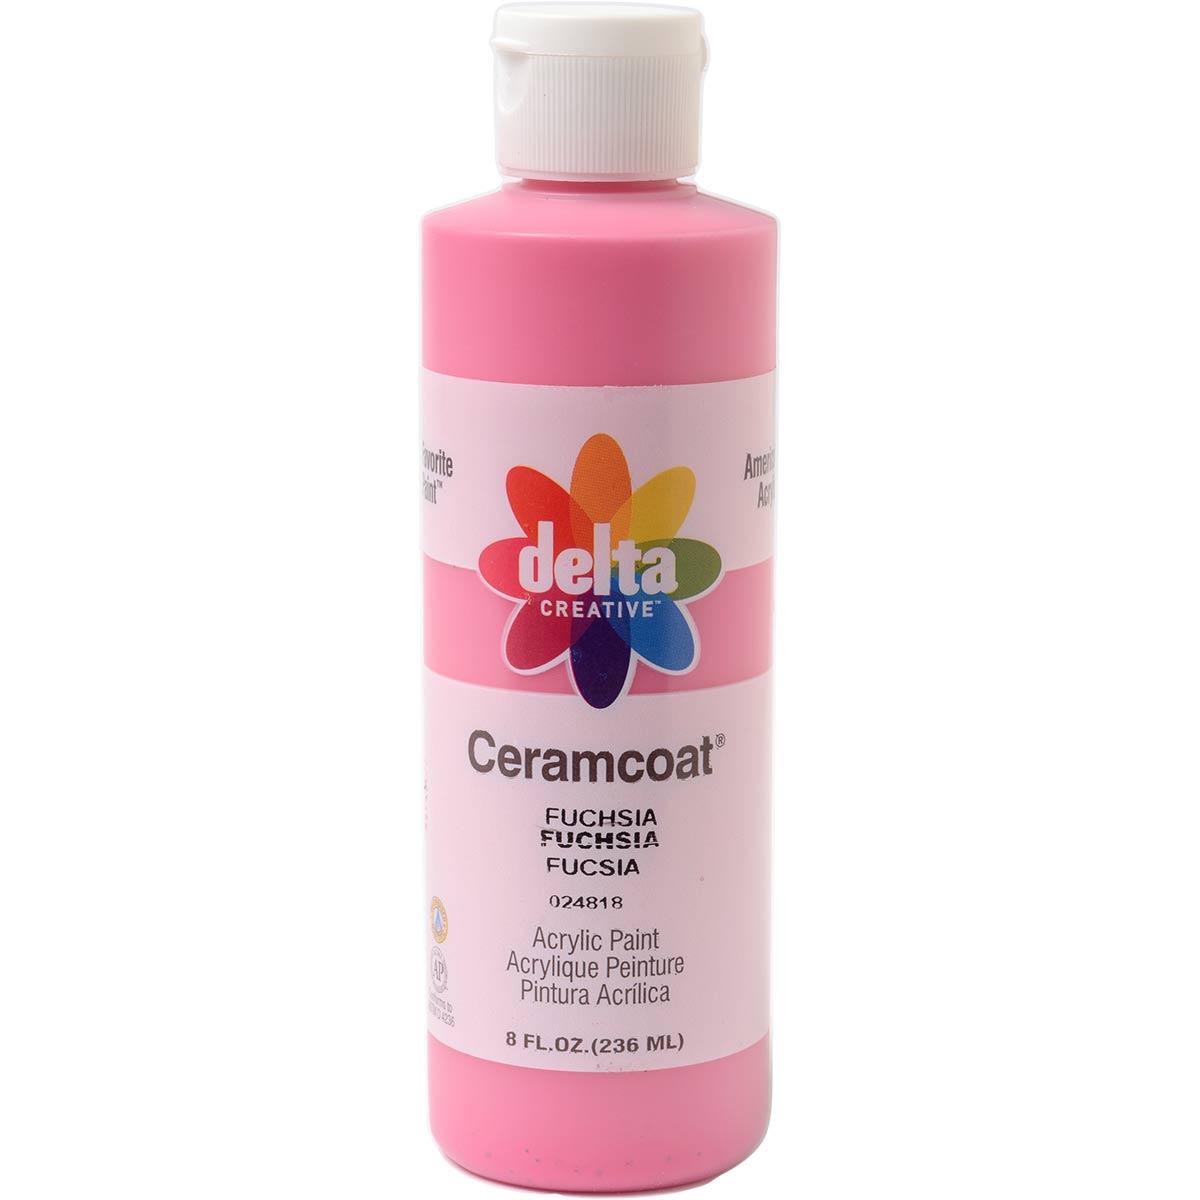 Delta Ceramcoat ® Acrylic Paint - Fuchsia, 8 oz. - 024810802W